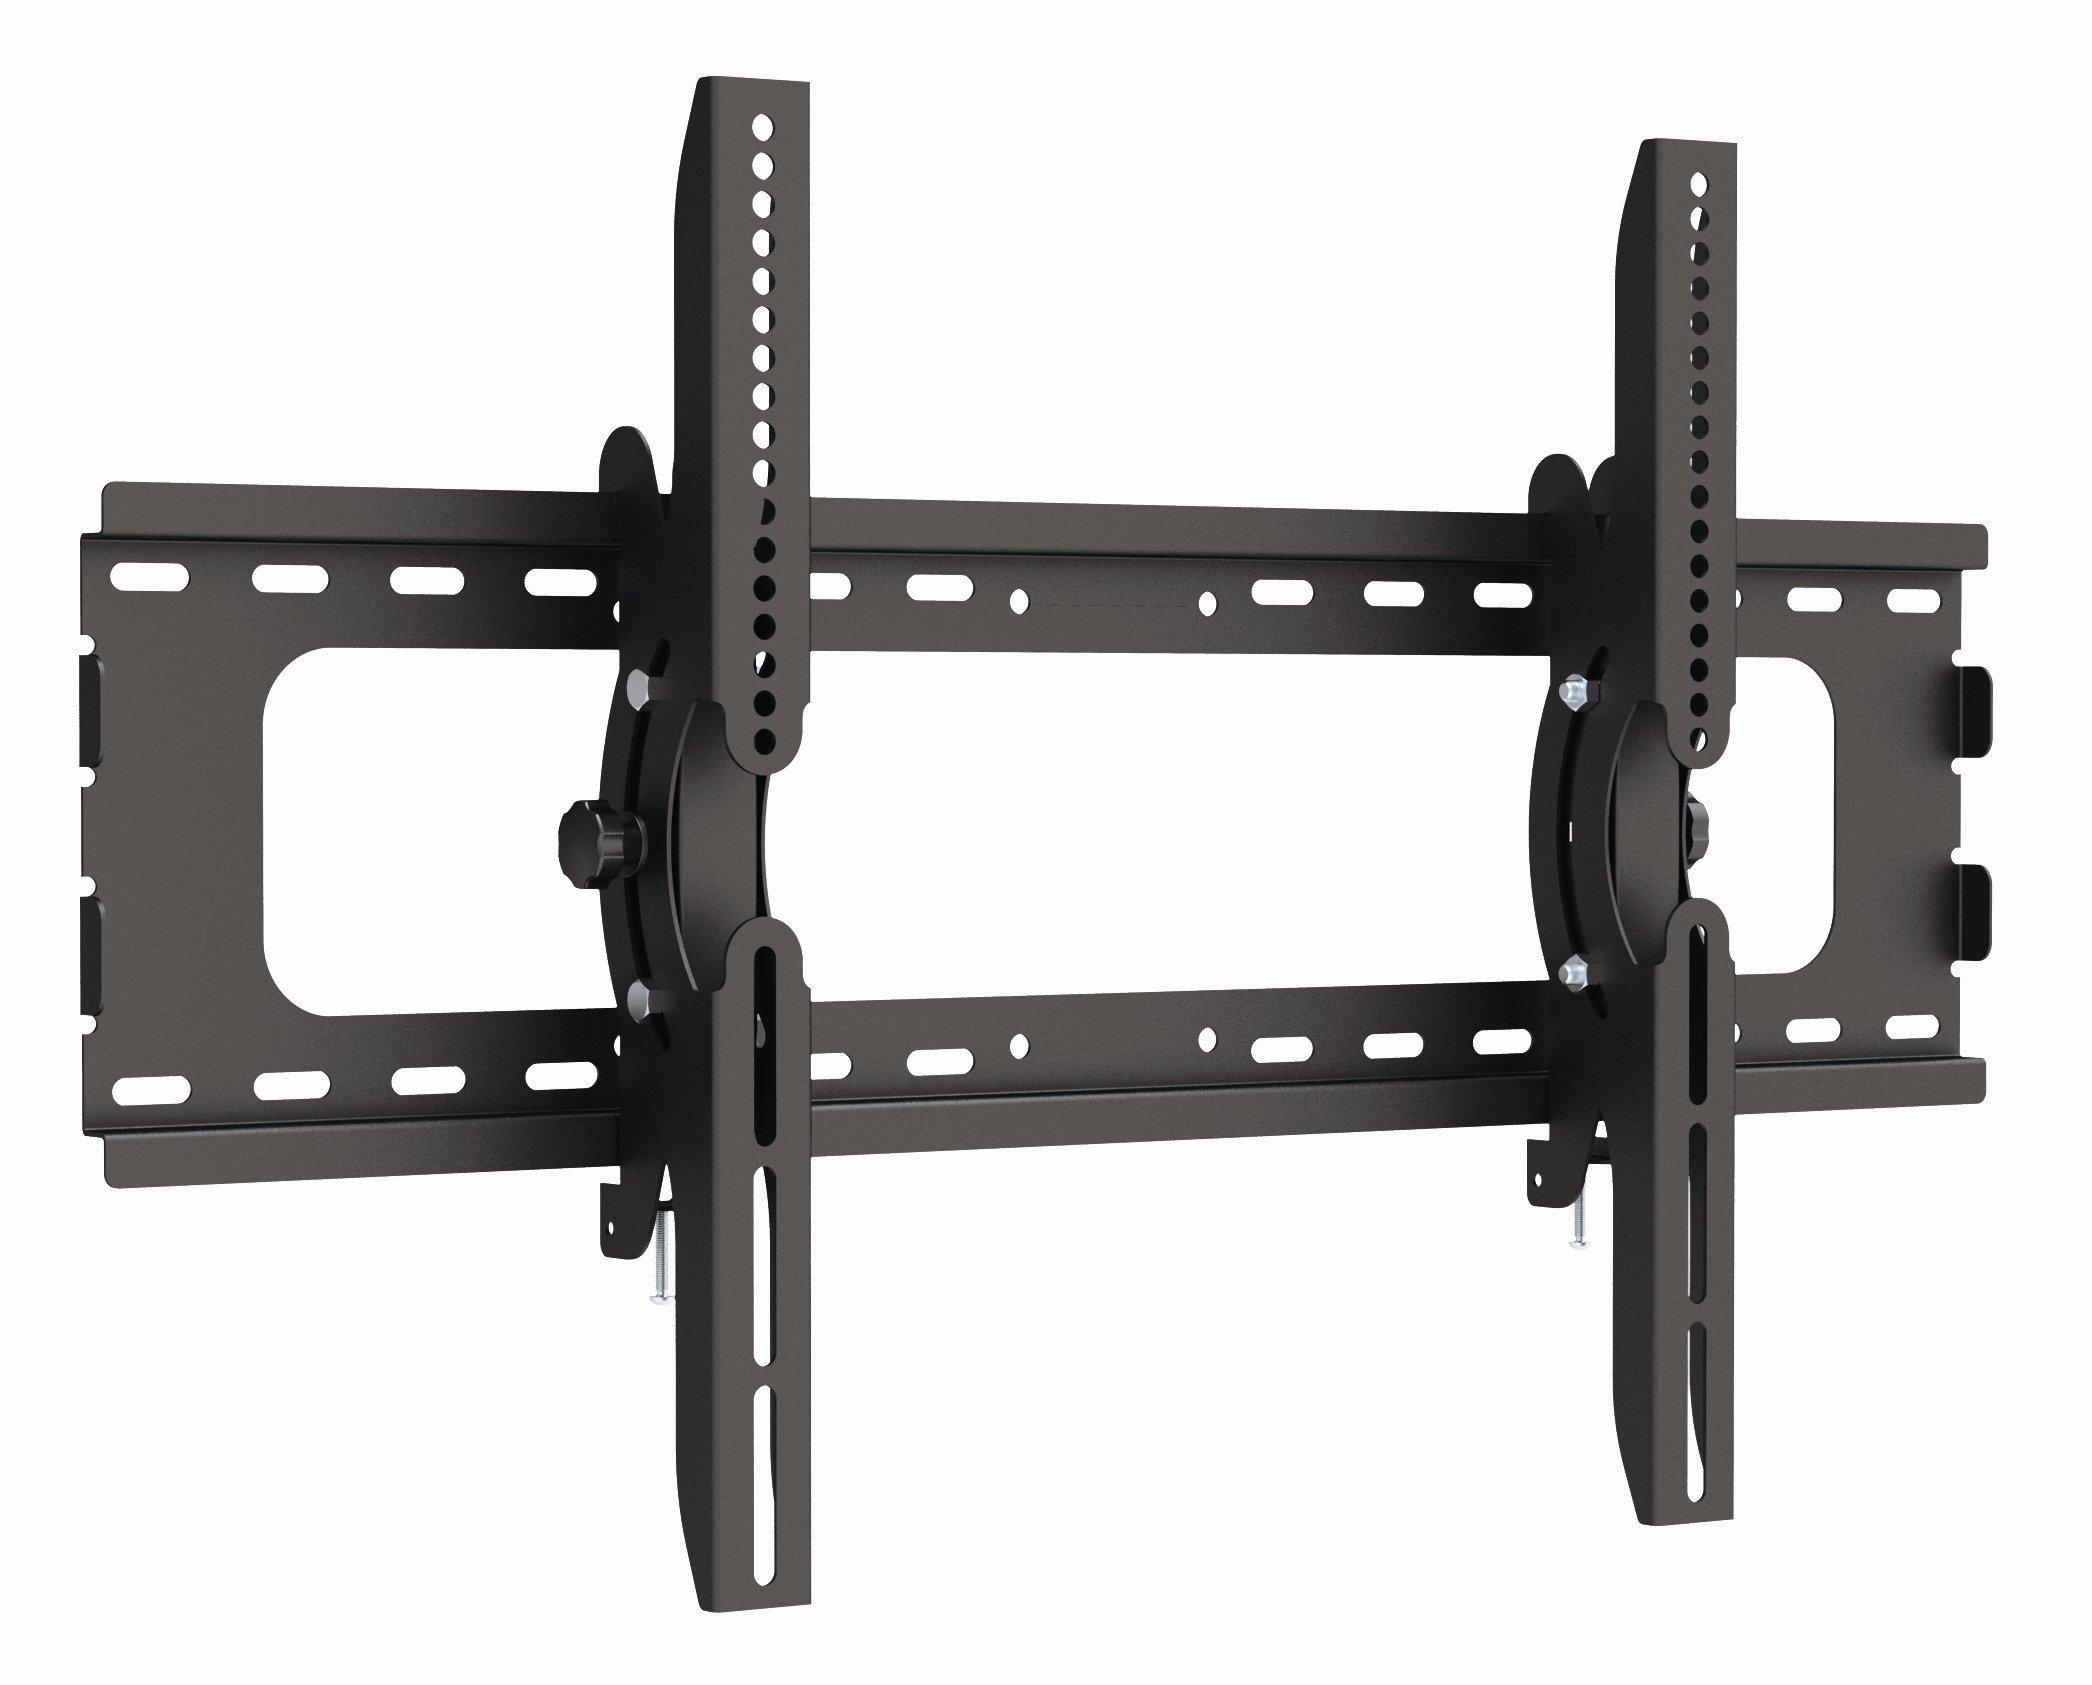 Husky Mounts 80 Inch Universal TV Wall Mount Tilting Super Heavy Duty Fits Most 80 70 65 60 55 50 47 42 40 Inch LED LCD Plasma Flat Screen TV Bracket up to VESA 760x470 (30''X 18'' ) and 165 Lbs